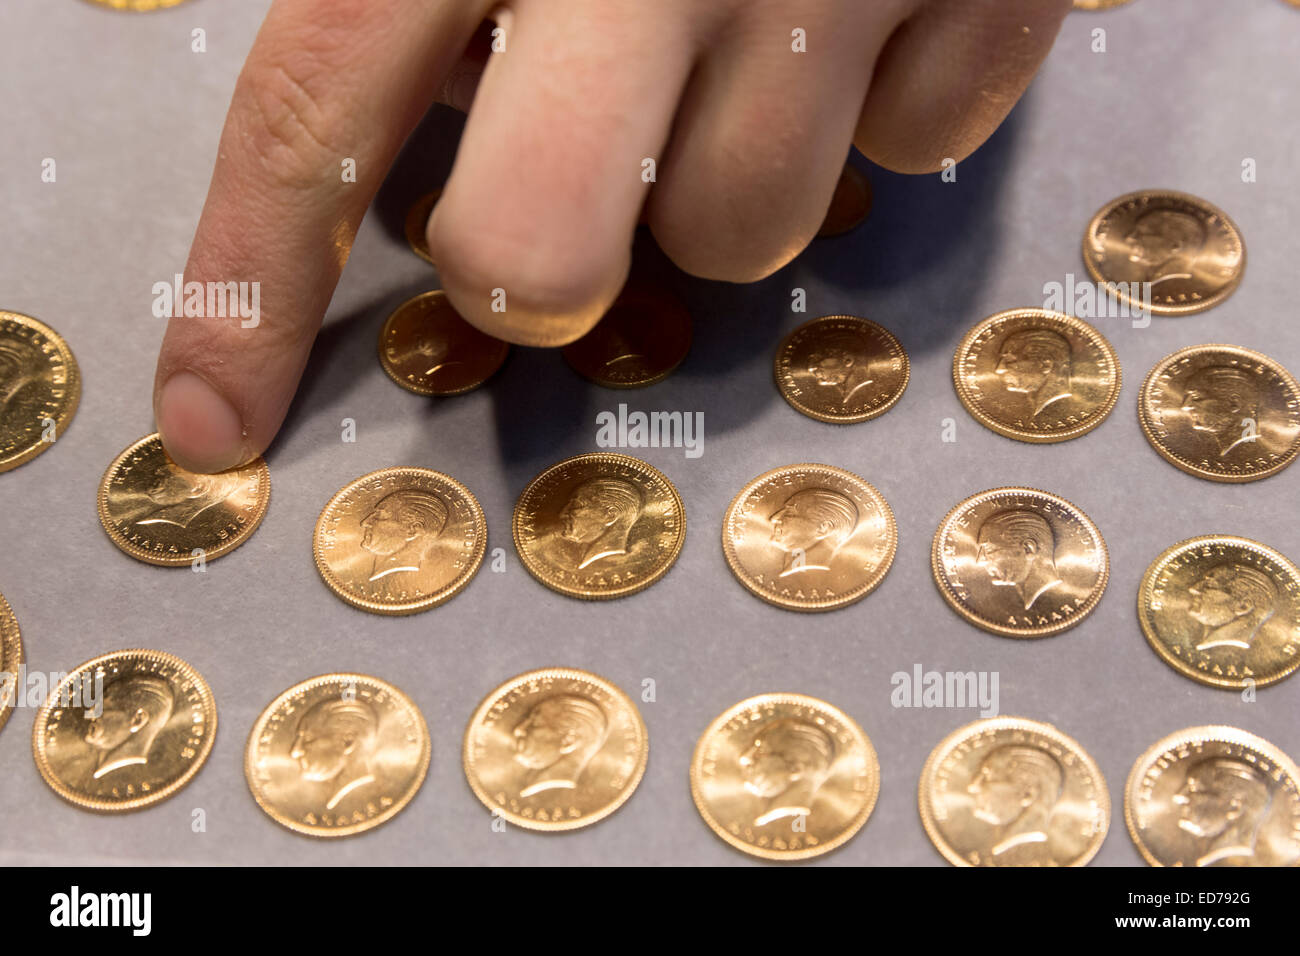 Gold Turkish lira coins Turk Lirasi 22 carat Ataturk image in The Grand Bazaar, Kapalicarsi, great market, Istanbul, Stock Photo